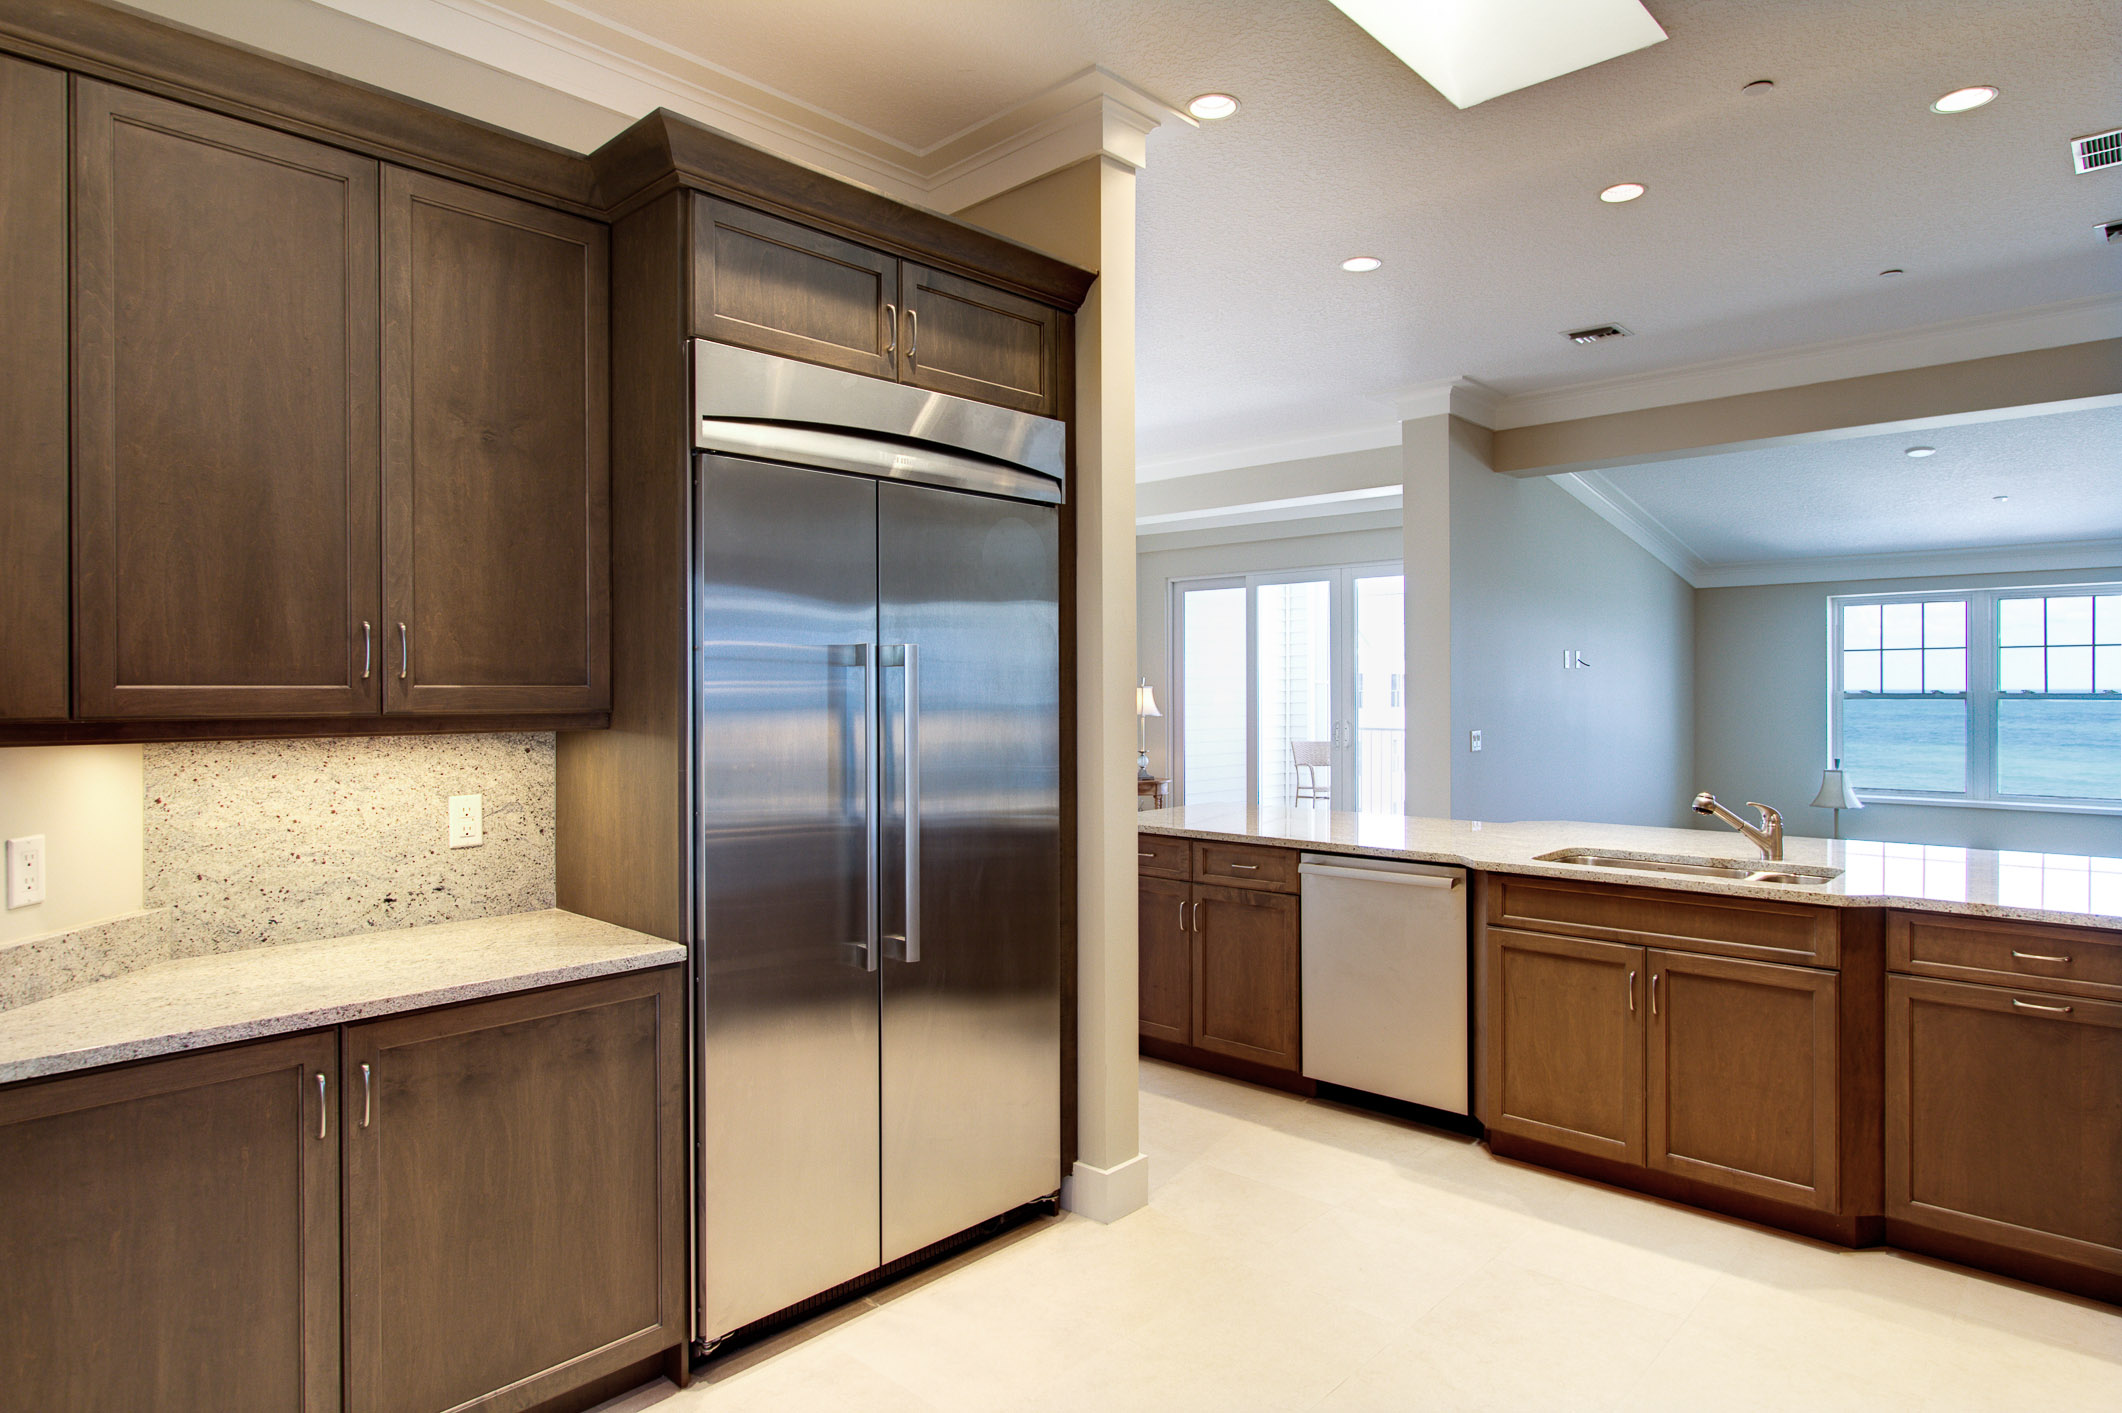 Kitchentoliving.jpg